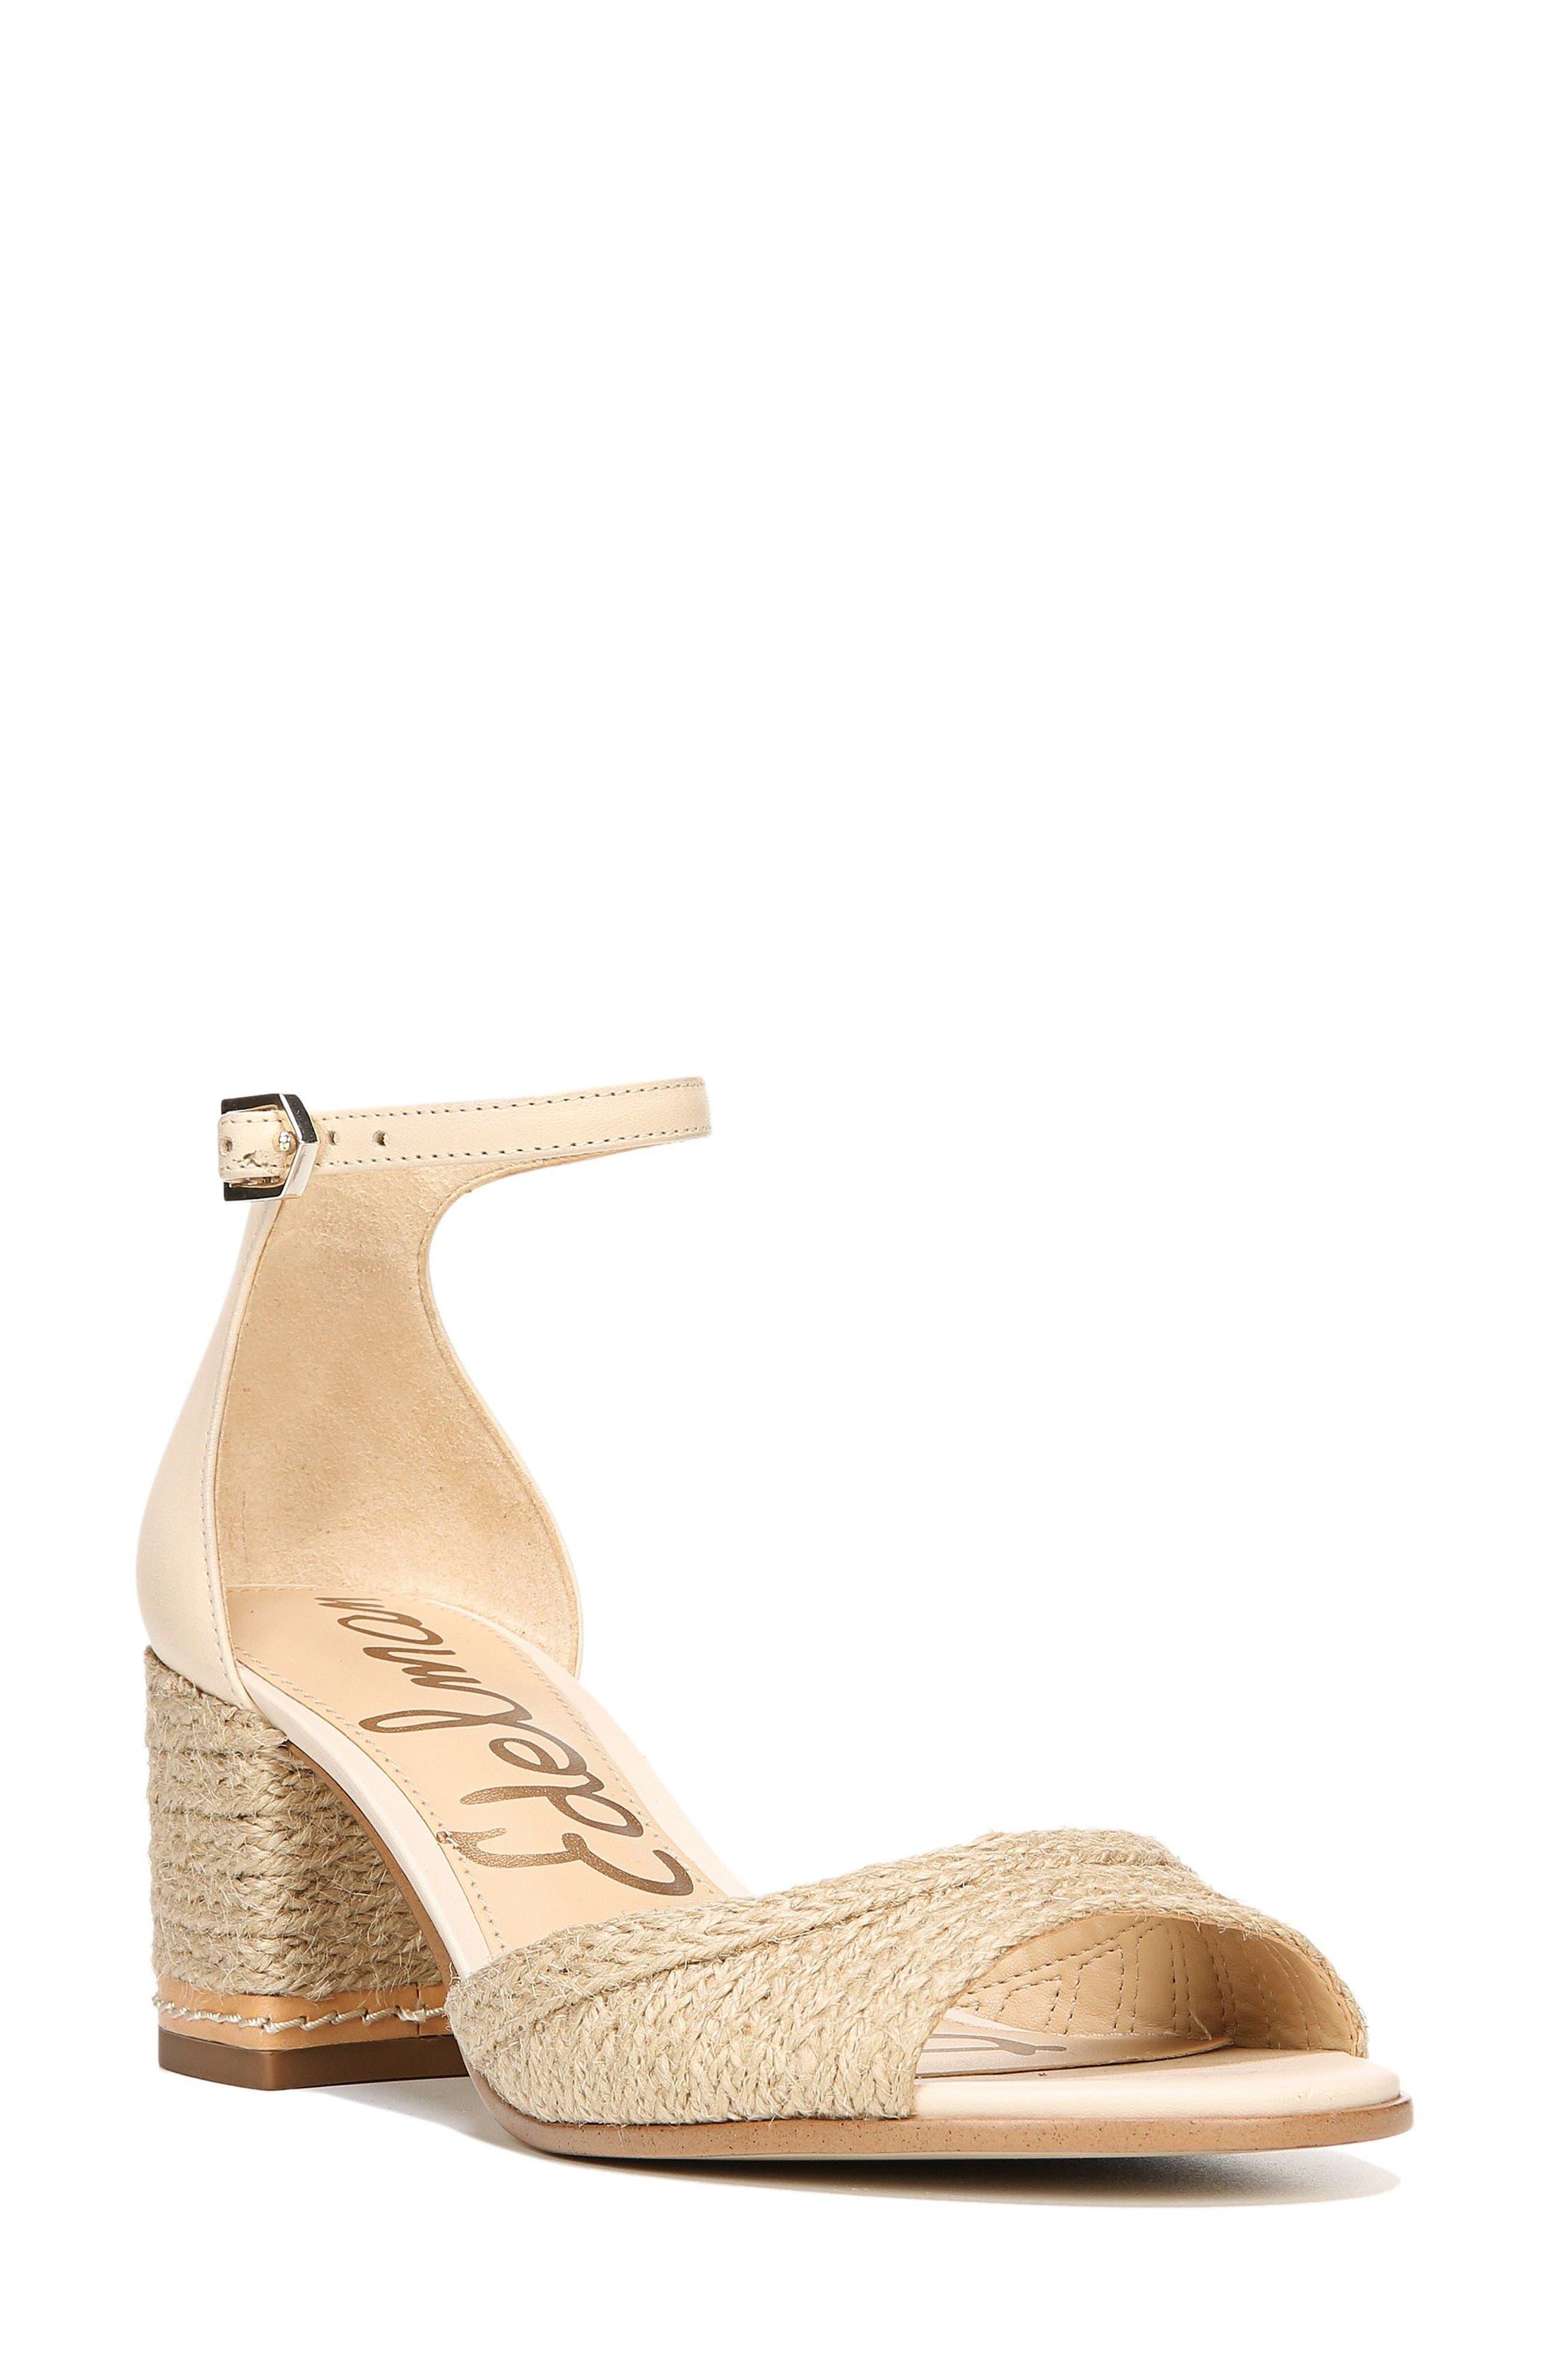 Alternate Image 1 Selected - Sam Edelman Susie 2 Ankle Strap Sandal (Women)